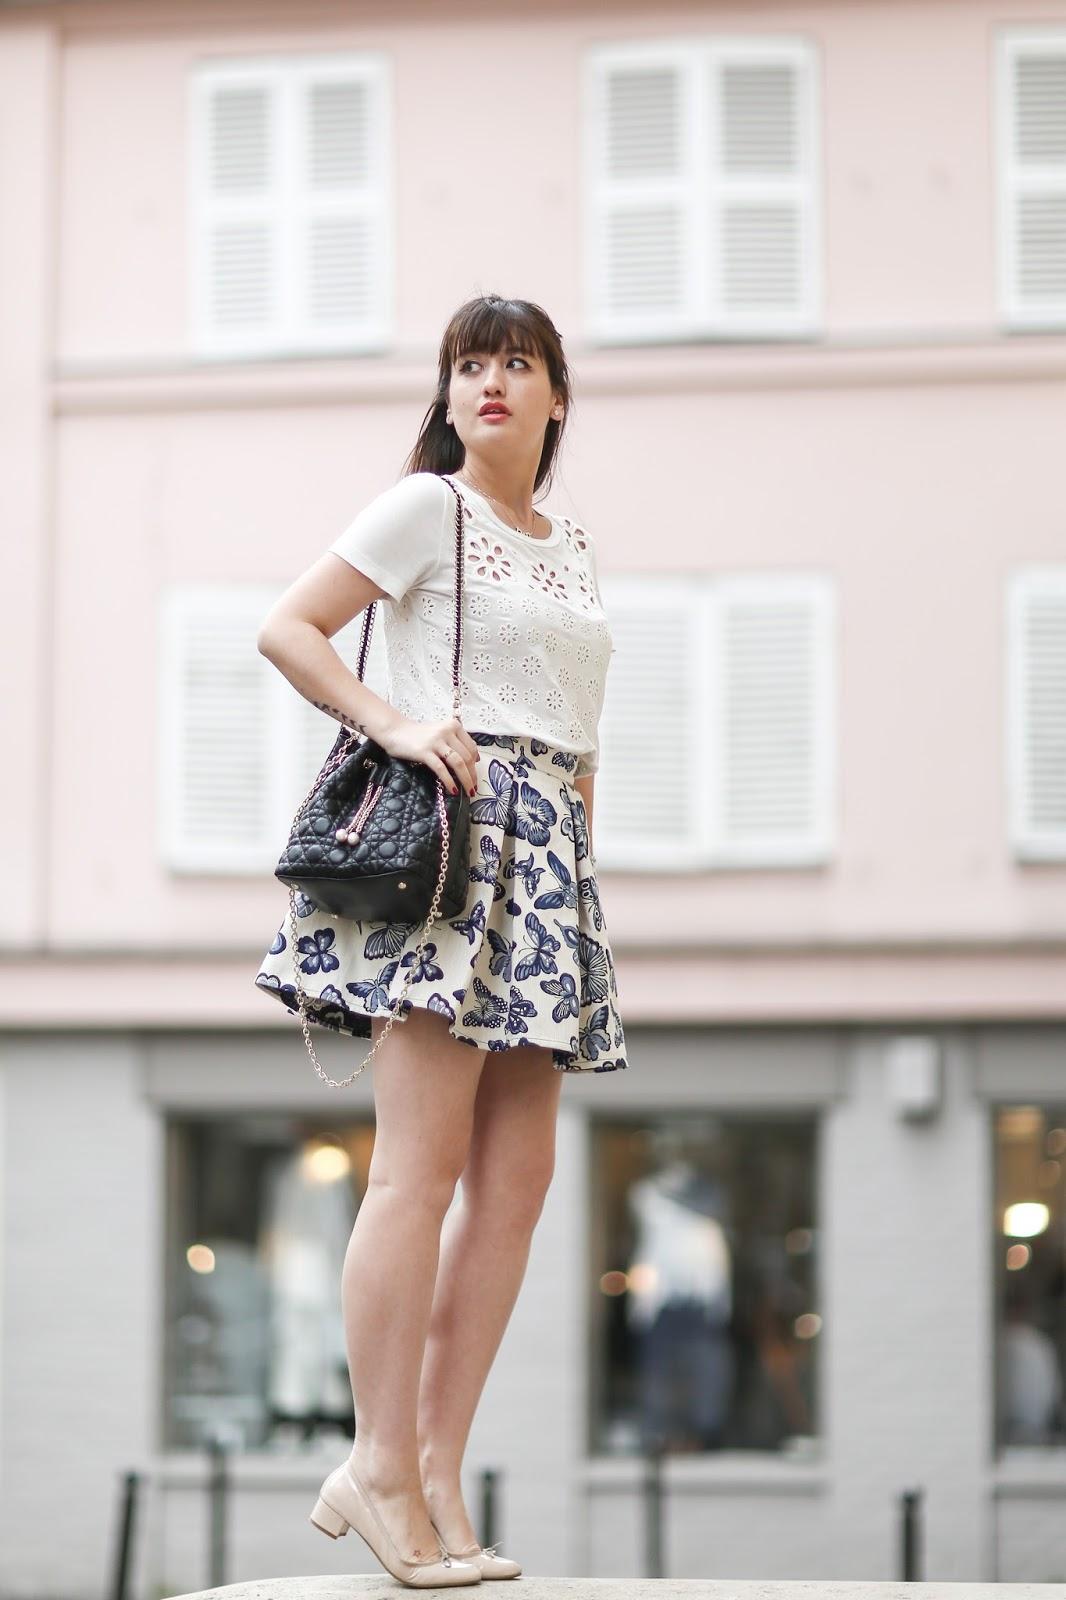 parisian fashion blogger, look, style, meetmeinparee, fashion, chic parisian style, manoush, chic wish